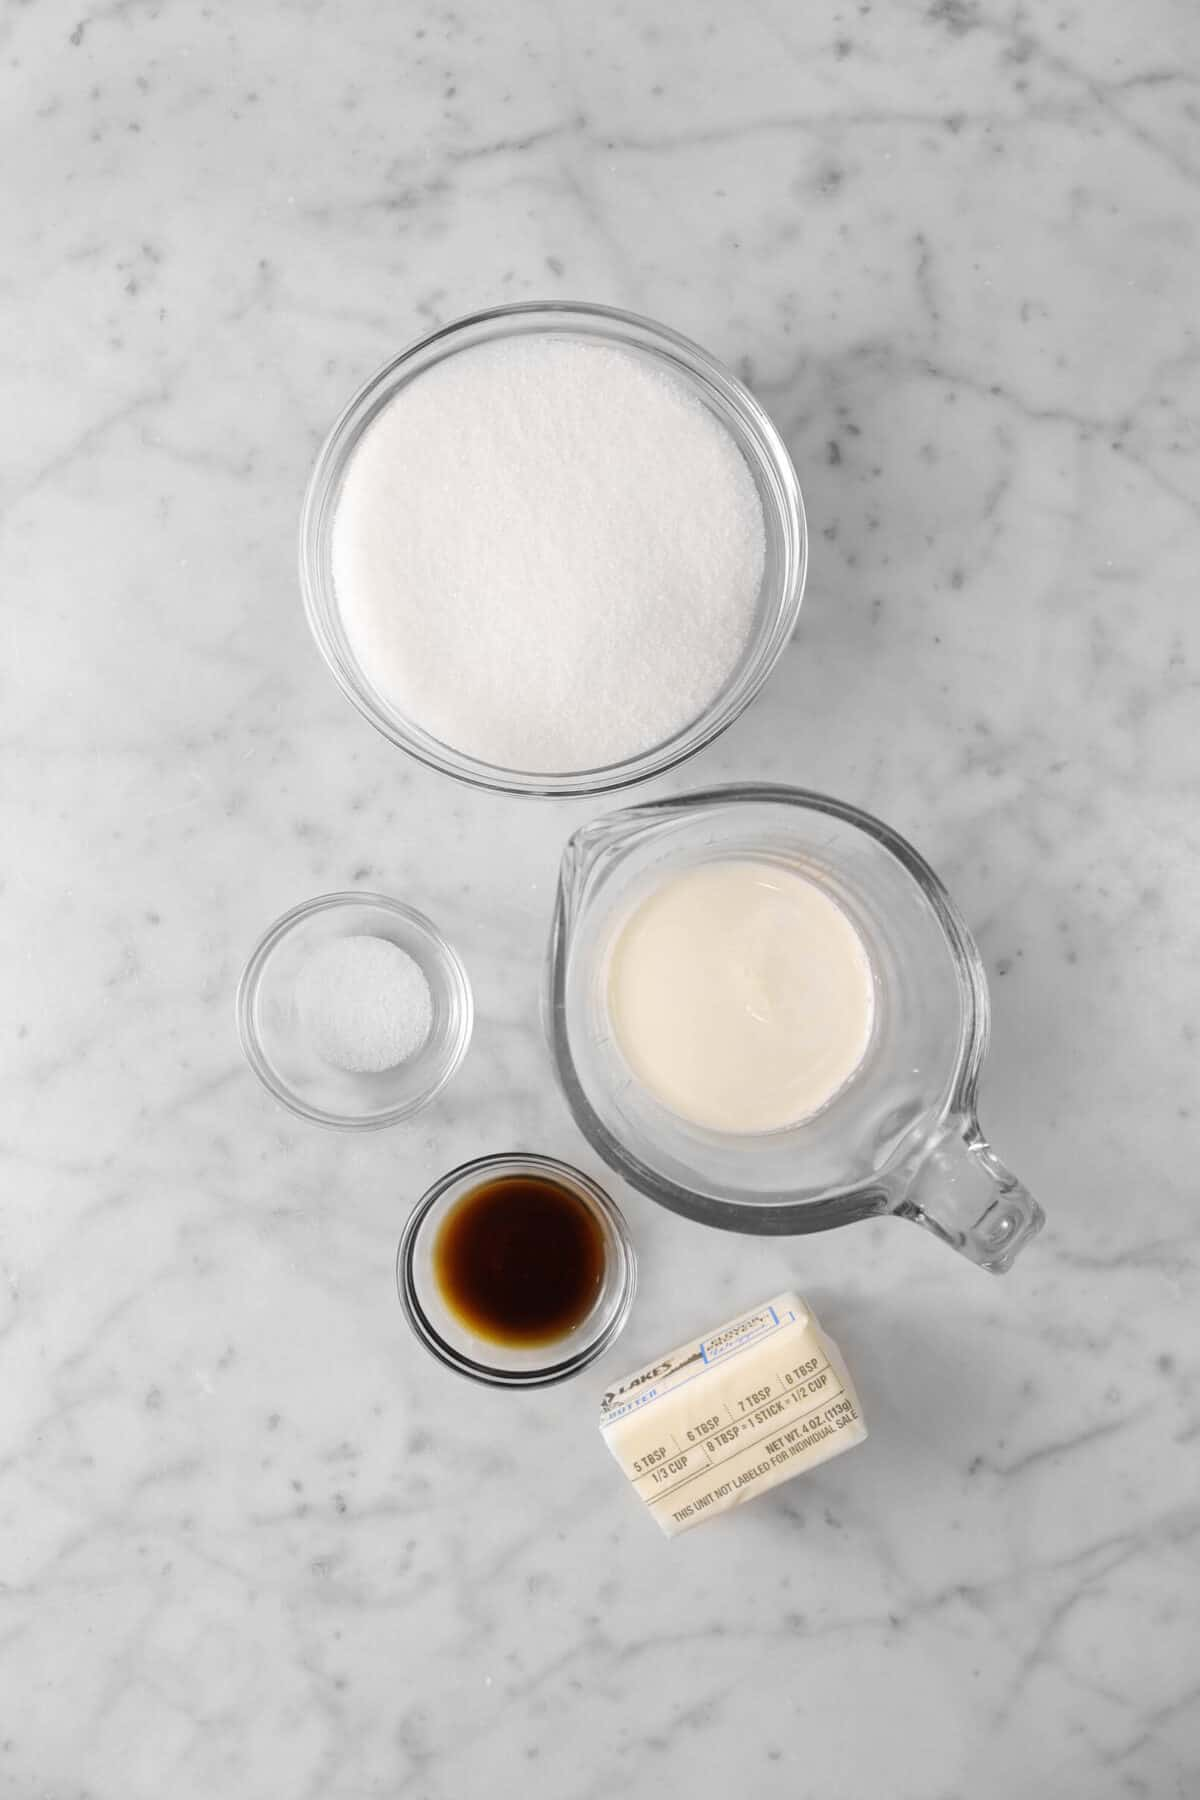 sugar, salt, heavy cream, vanilla, and butter